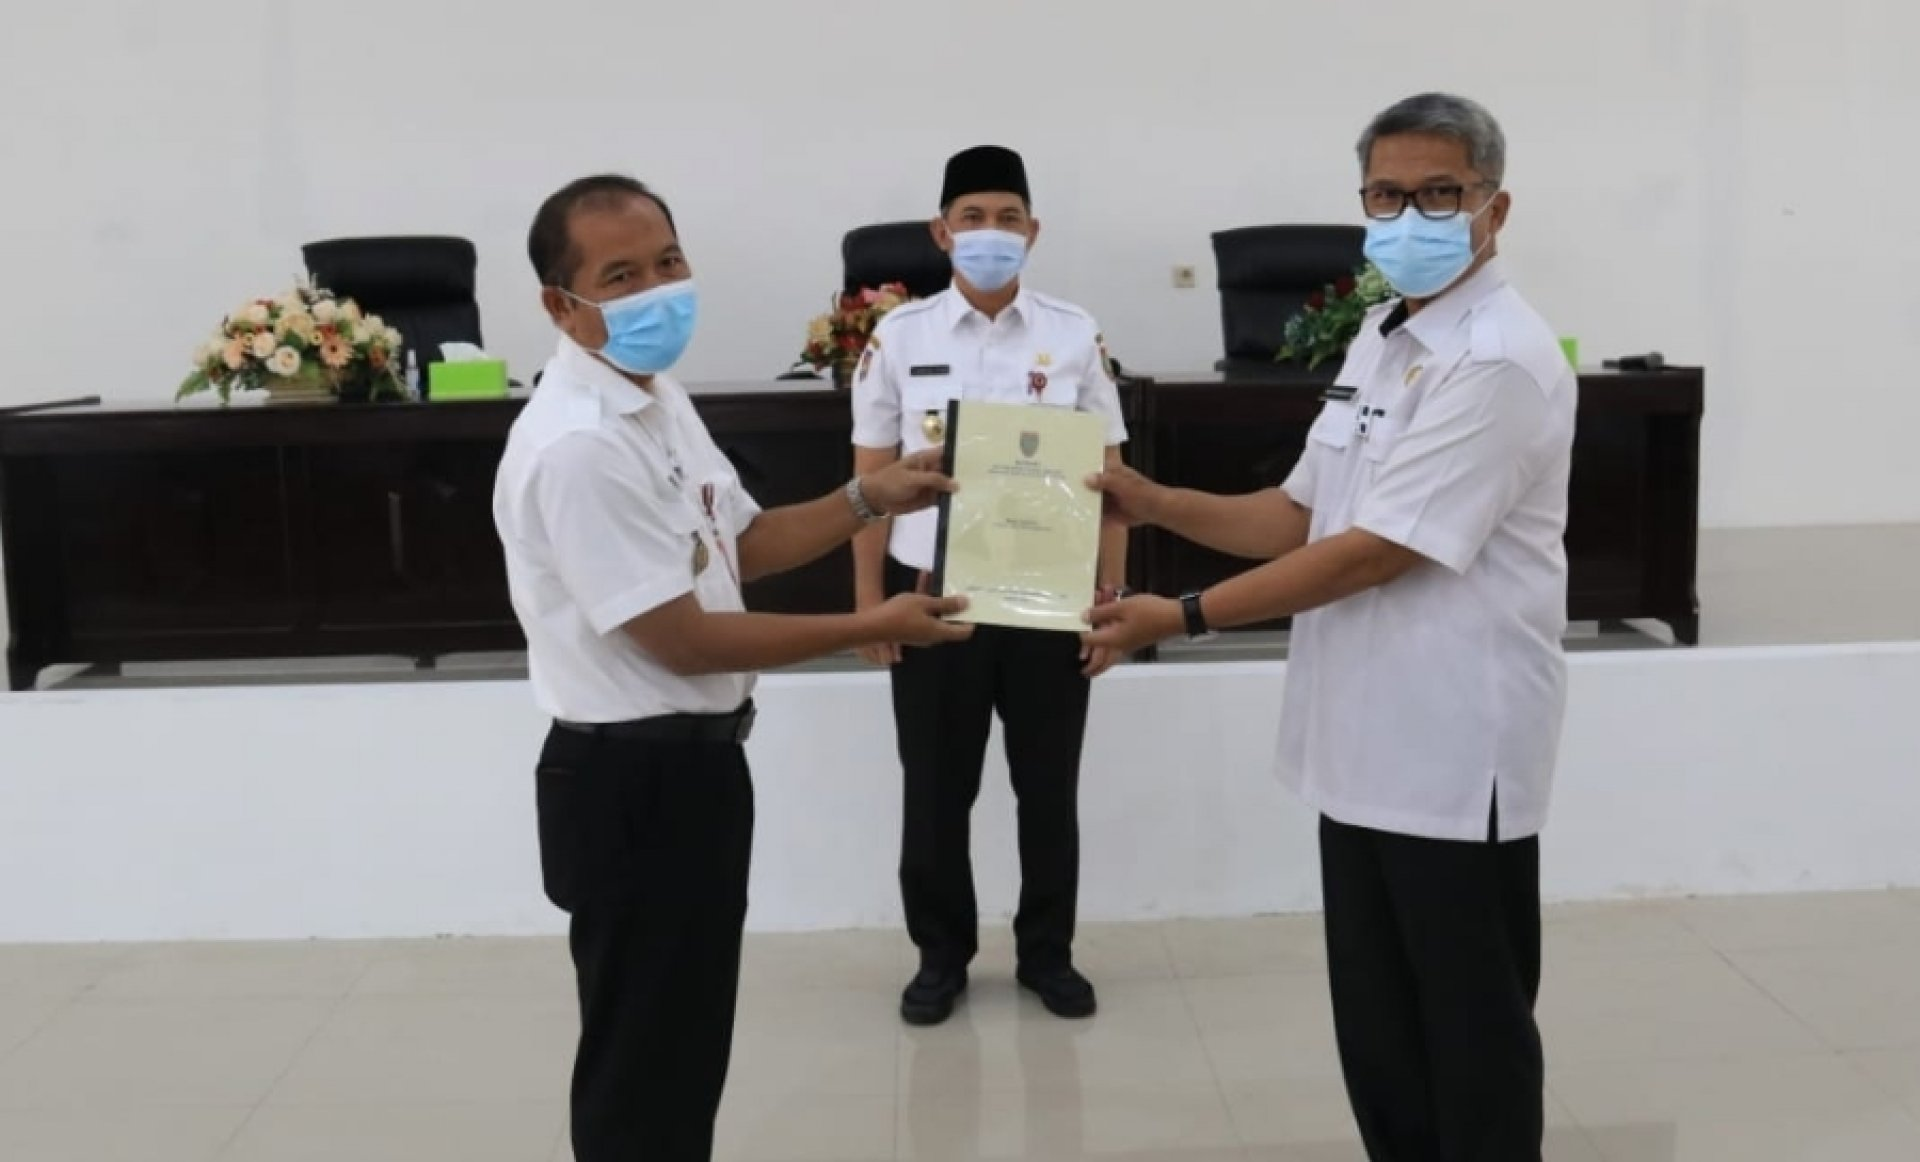 Sekda Fahrizal Fitri Hadiri Serah Terima Jabatan Pimpinan Tinggi Pratama Inspektorat Kalteng